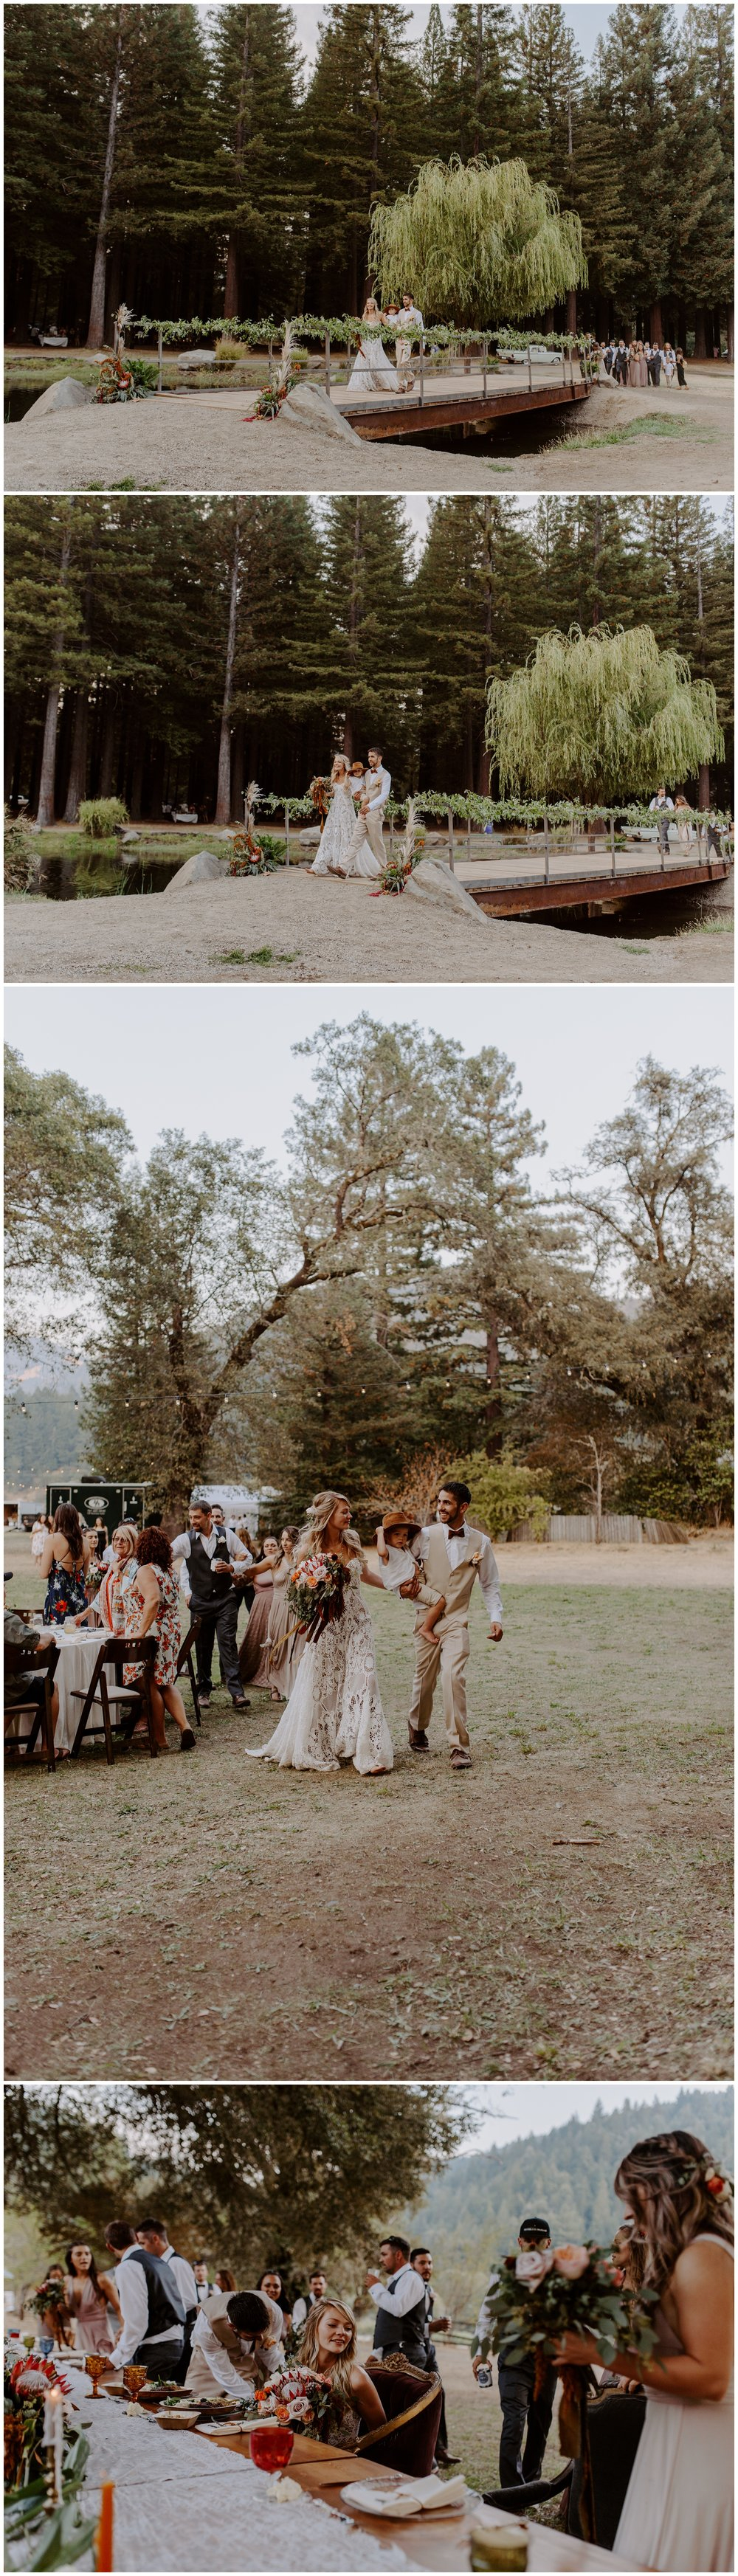 Redwood Festival Wedding Humbolt California - Jessica Heron Images_0064.jpg